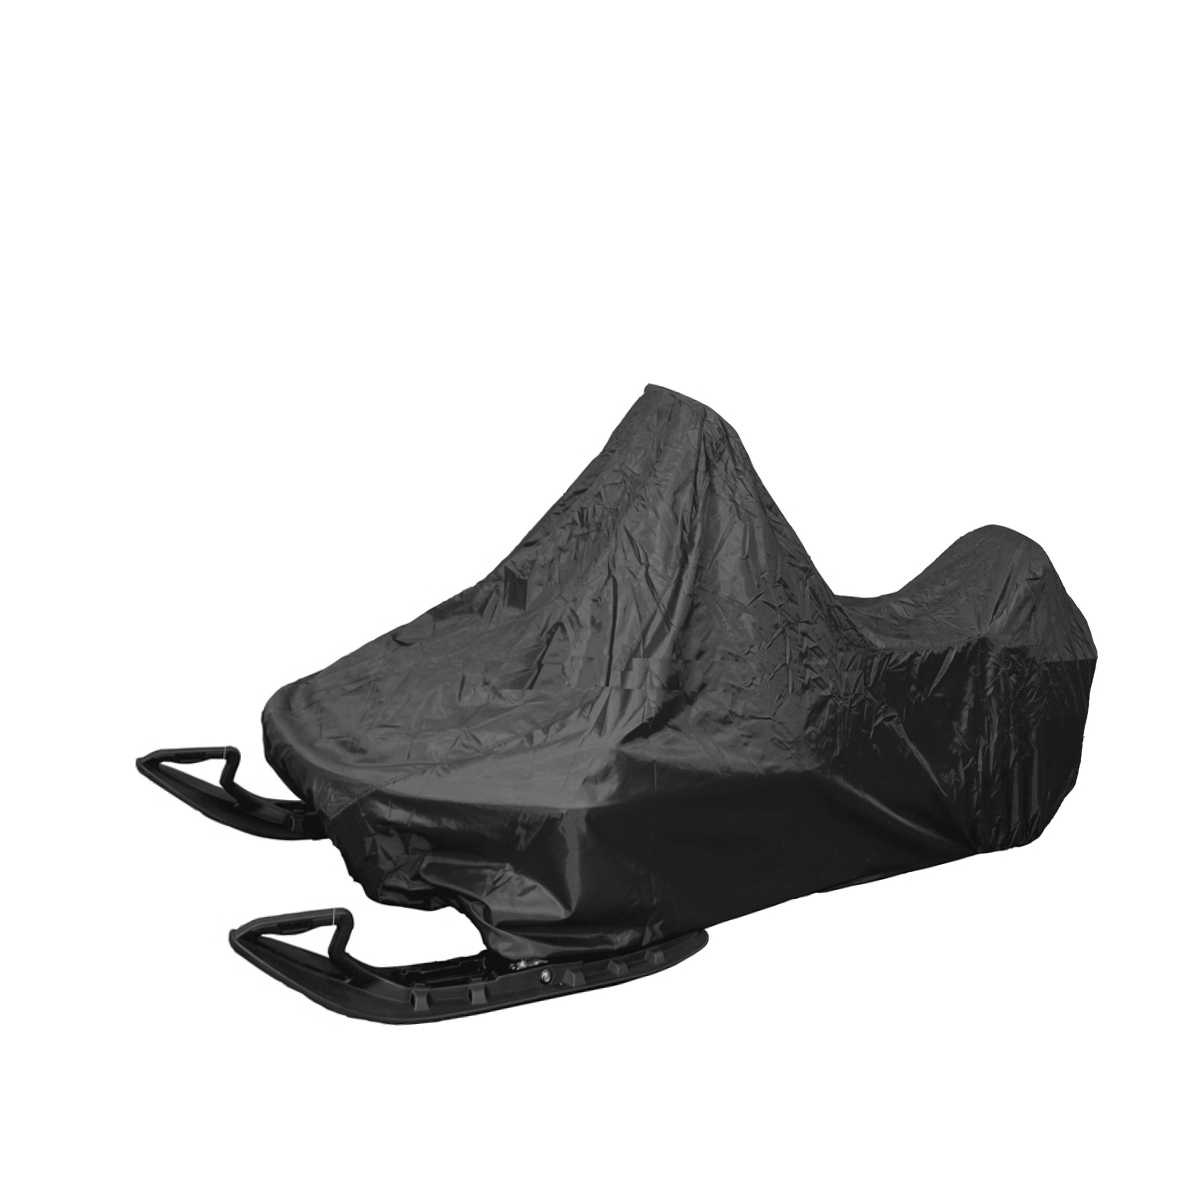 Чехол AG-brand, для снегохода Yamaha Viking 540, цвет: черный